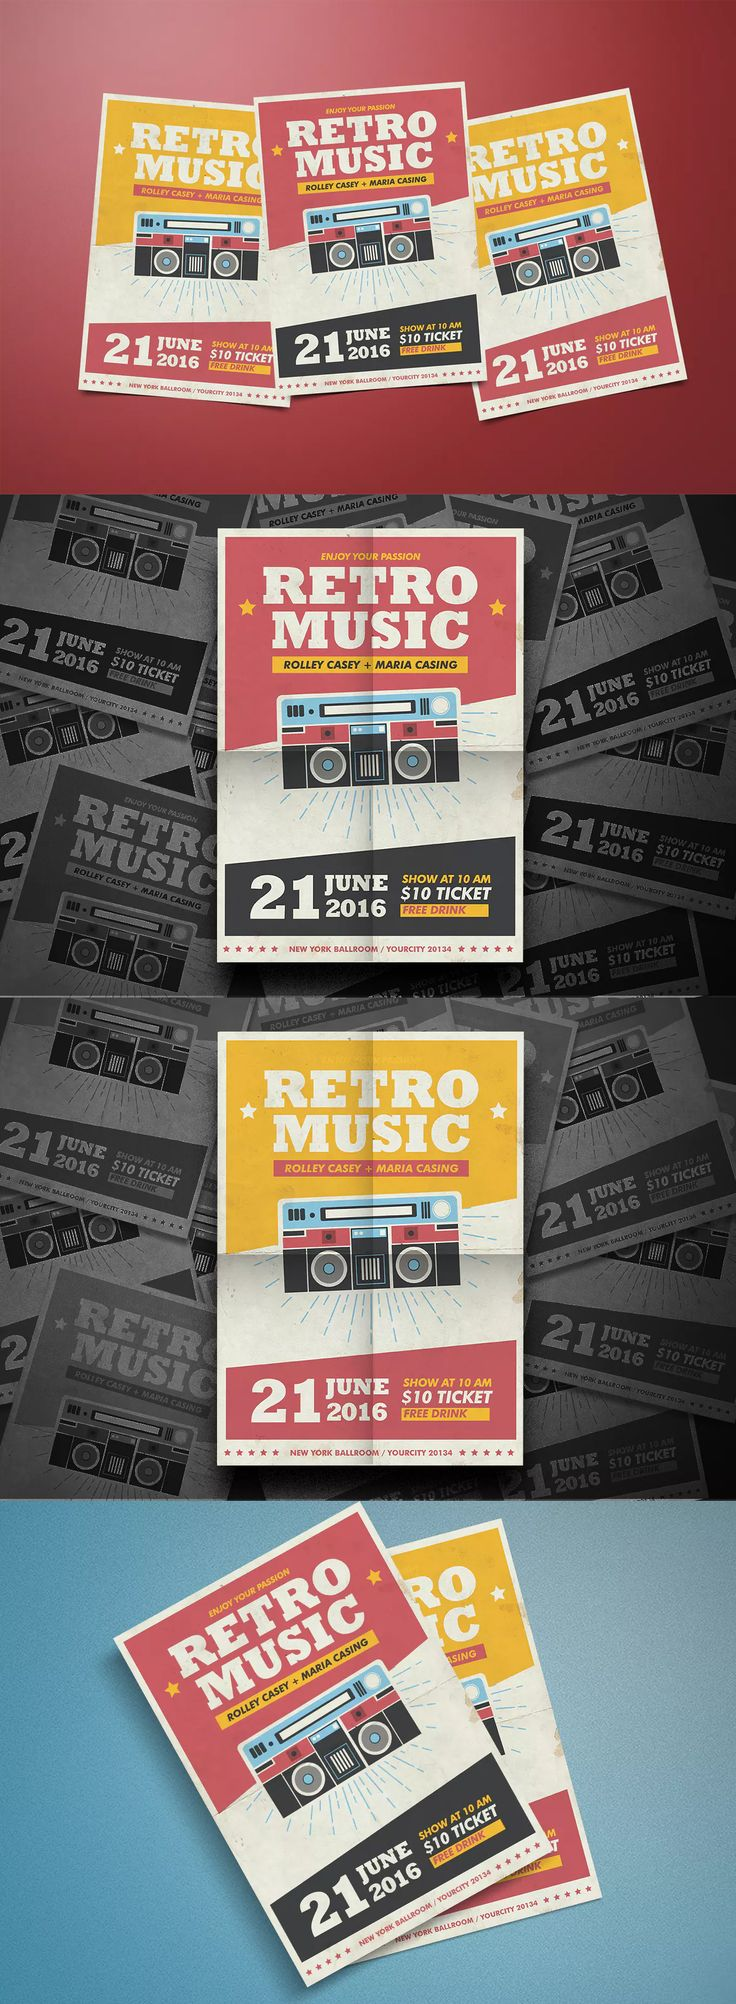 Retro Radio Flyer Template PSD